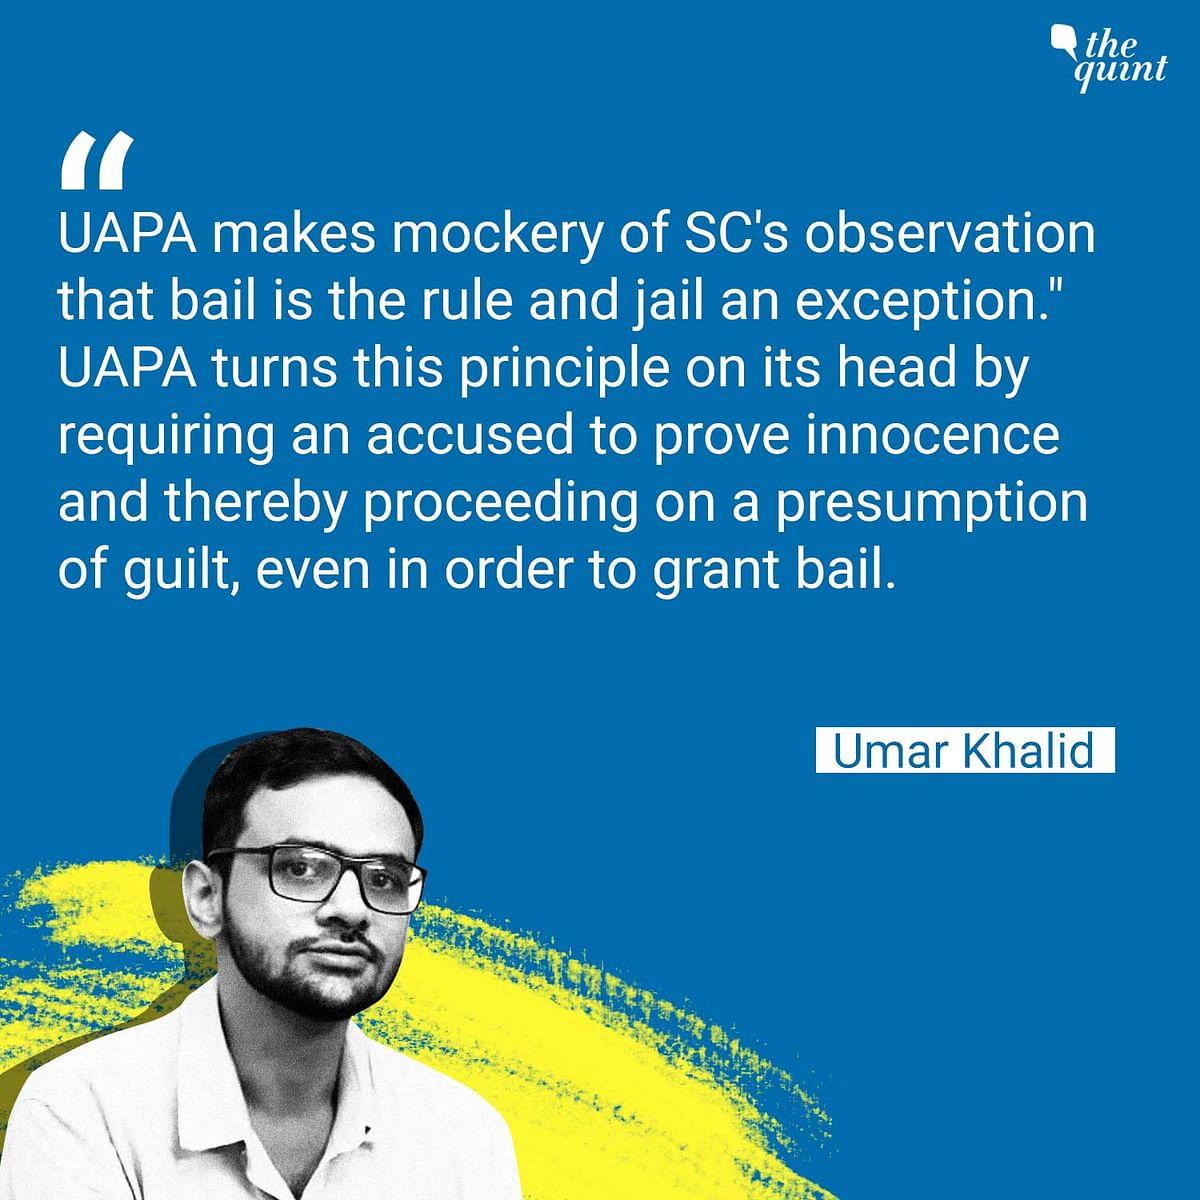 'Release Political Prisoners': We Read Umar Khalid's Letter